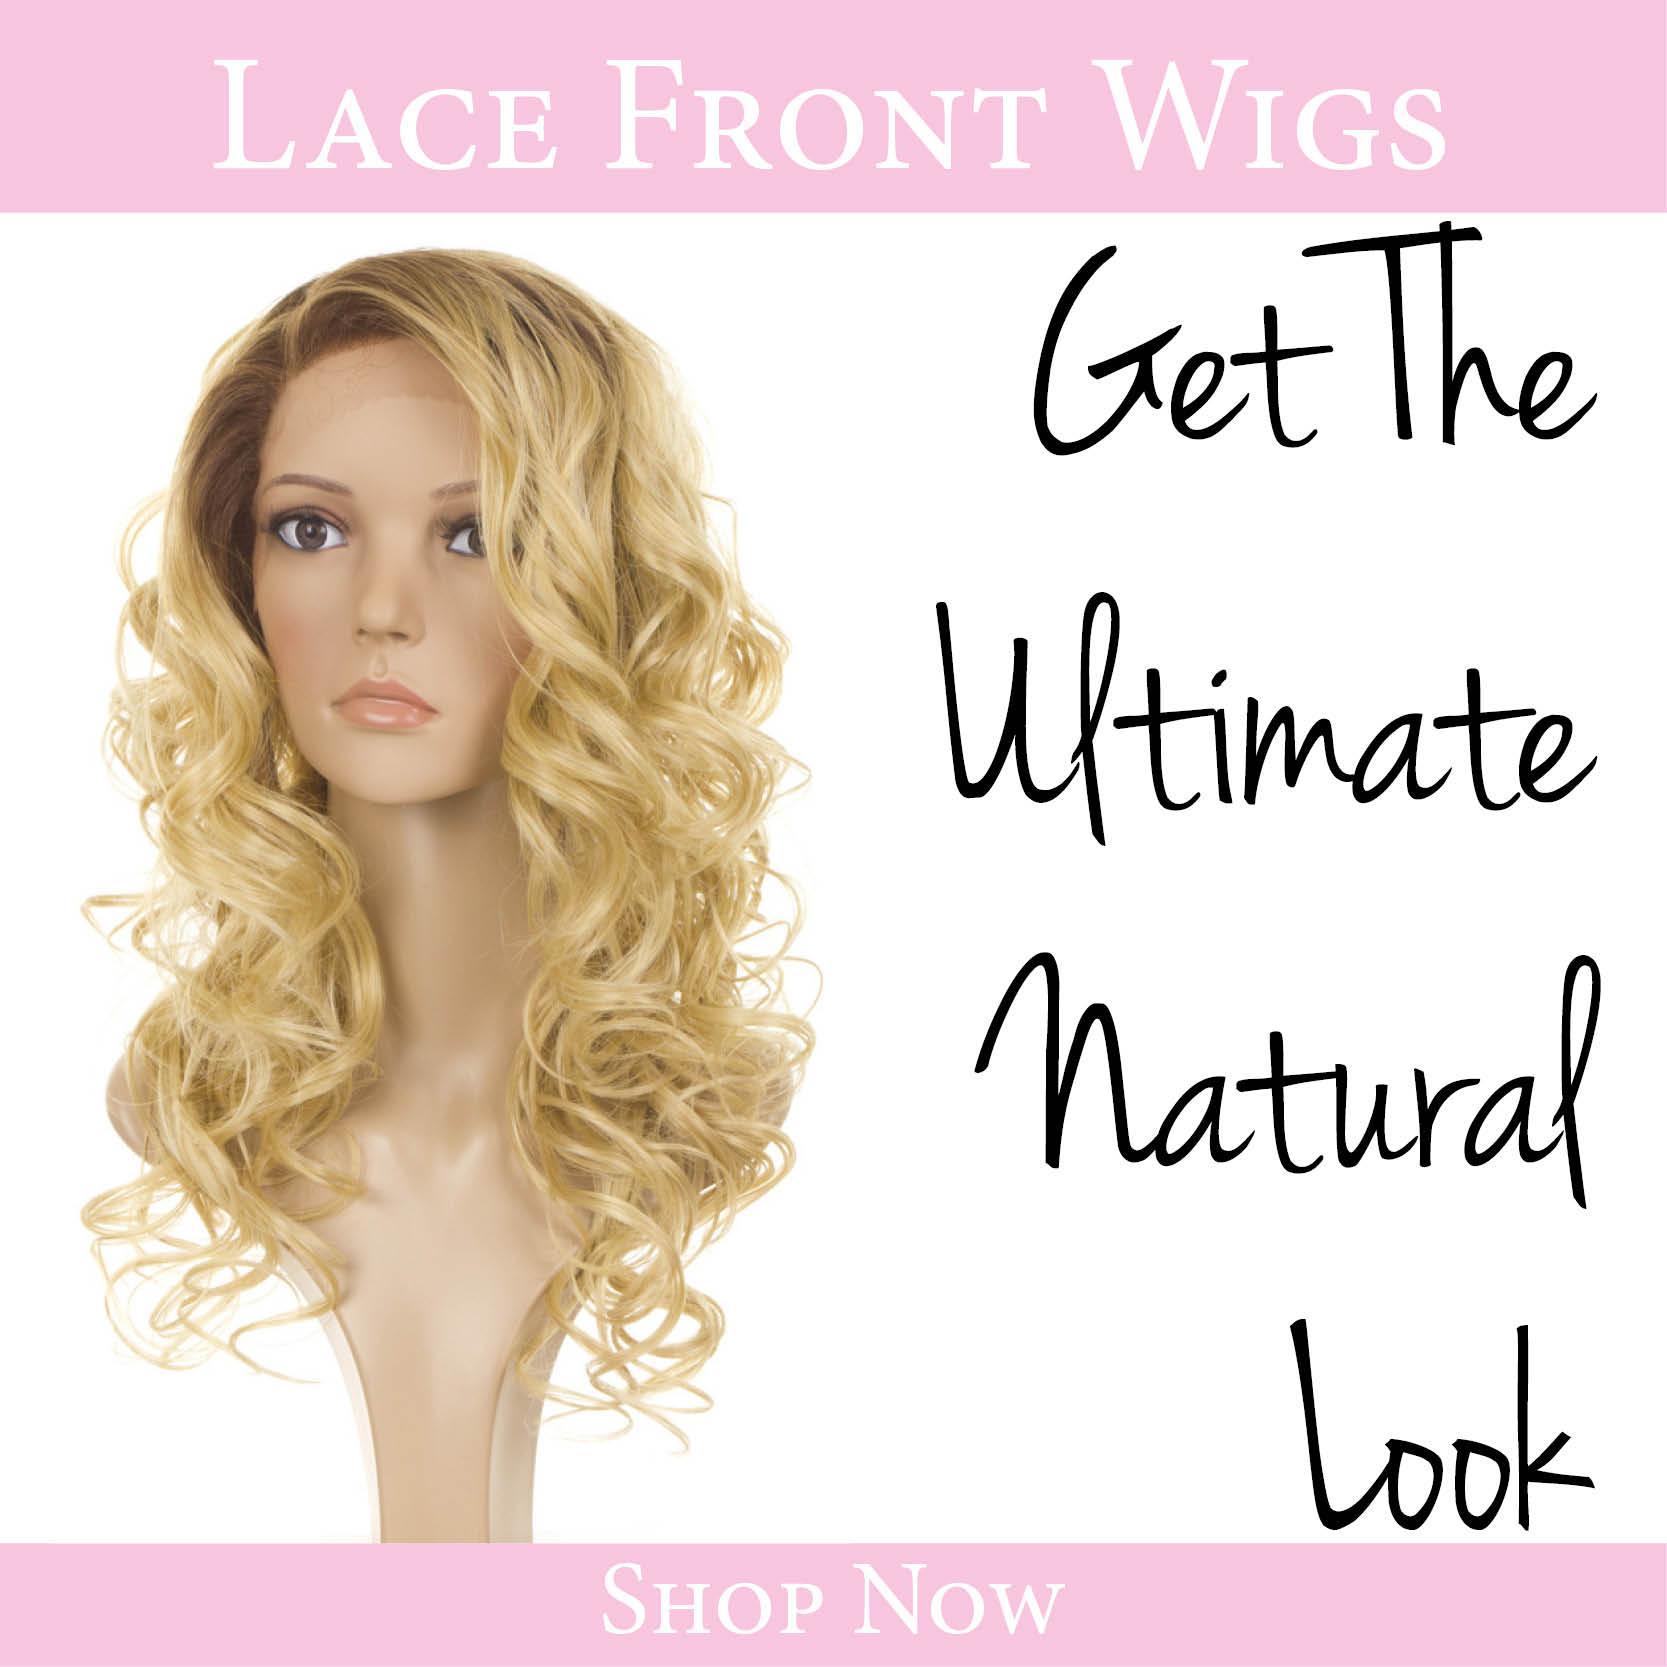 nayural-lace-wigs-22-f-f.jpg